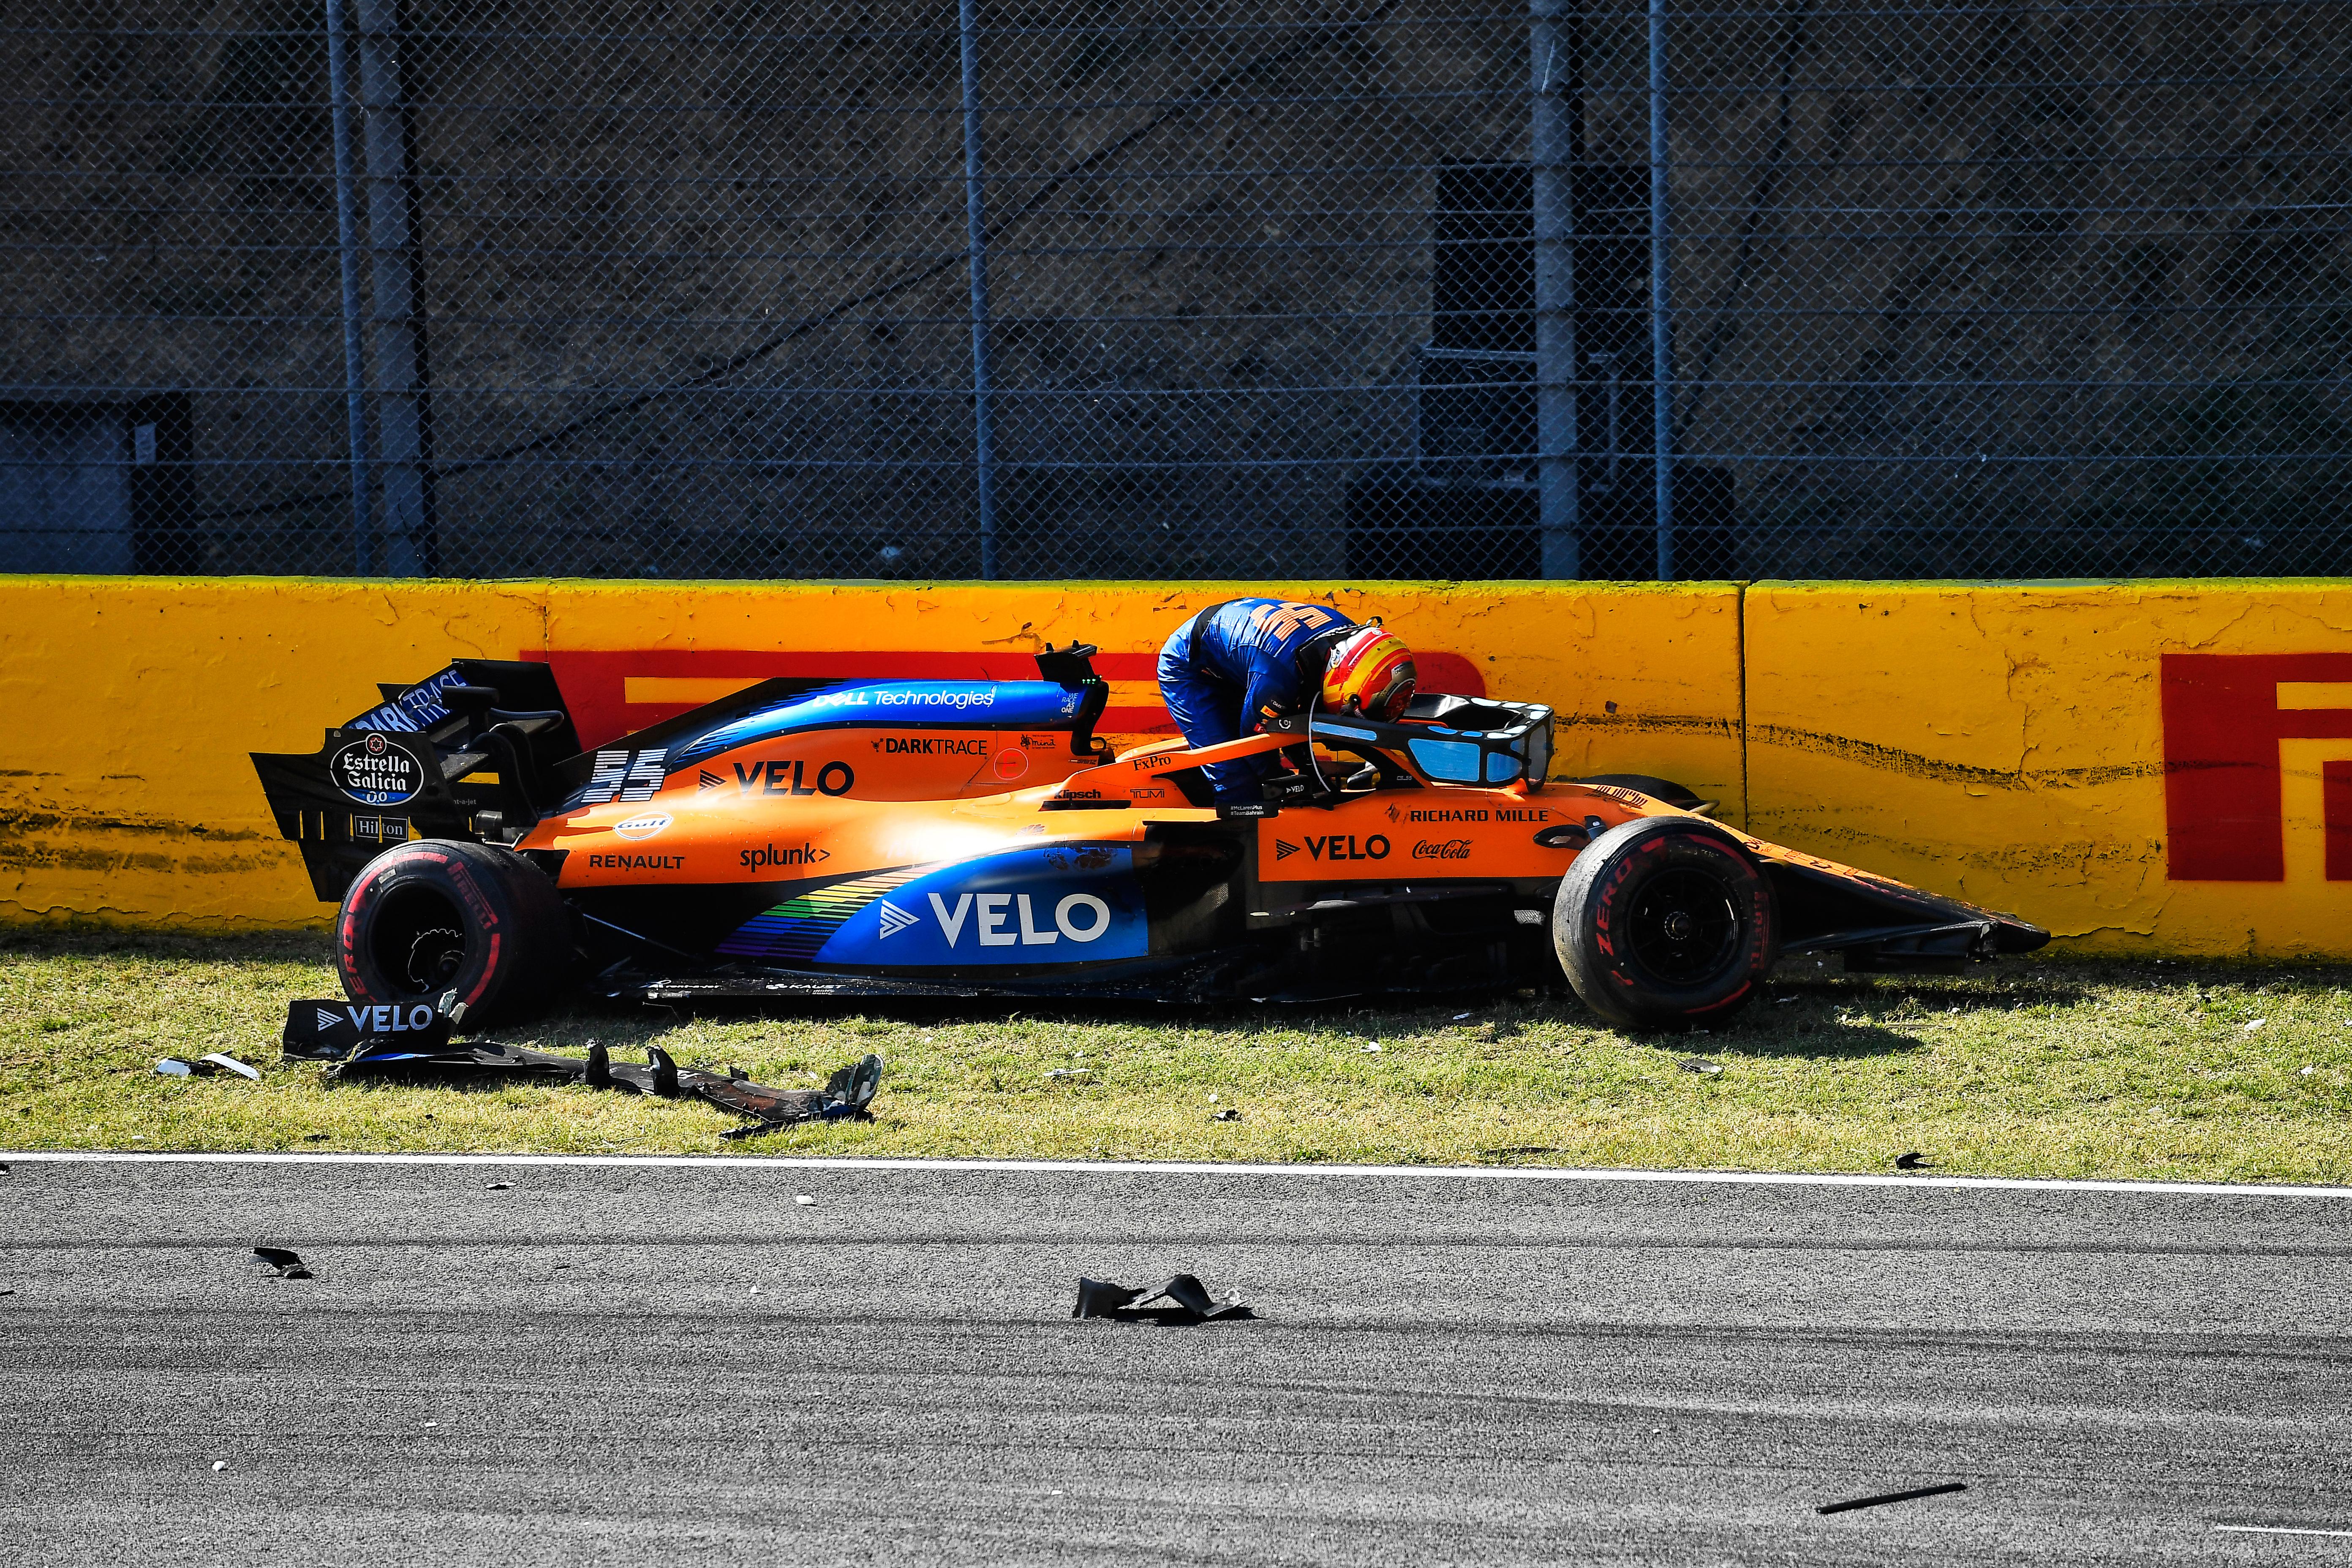 Carlos Sainz Jr McLaren damage Mugello crash 2020